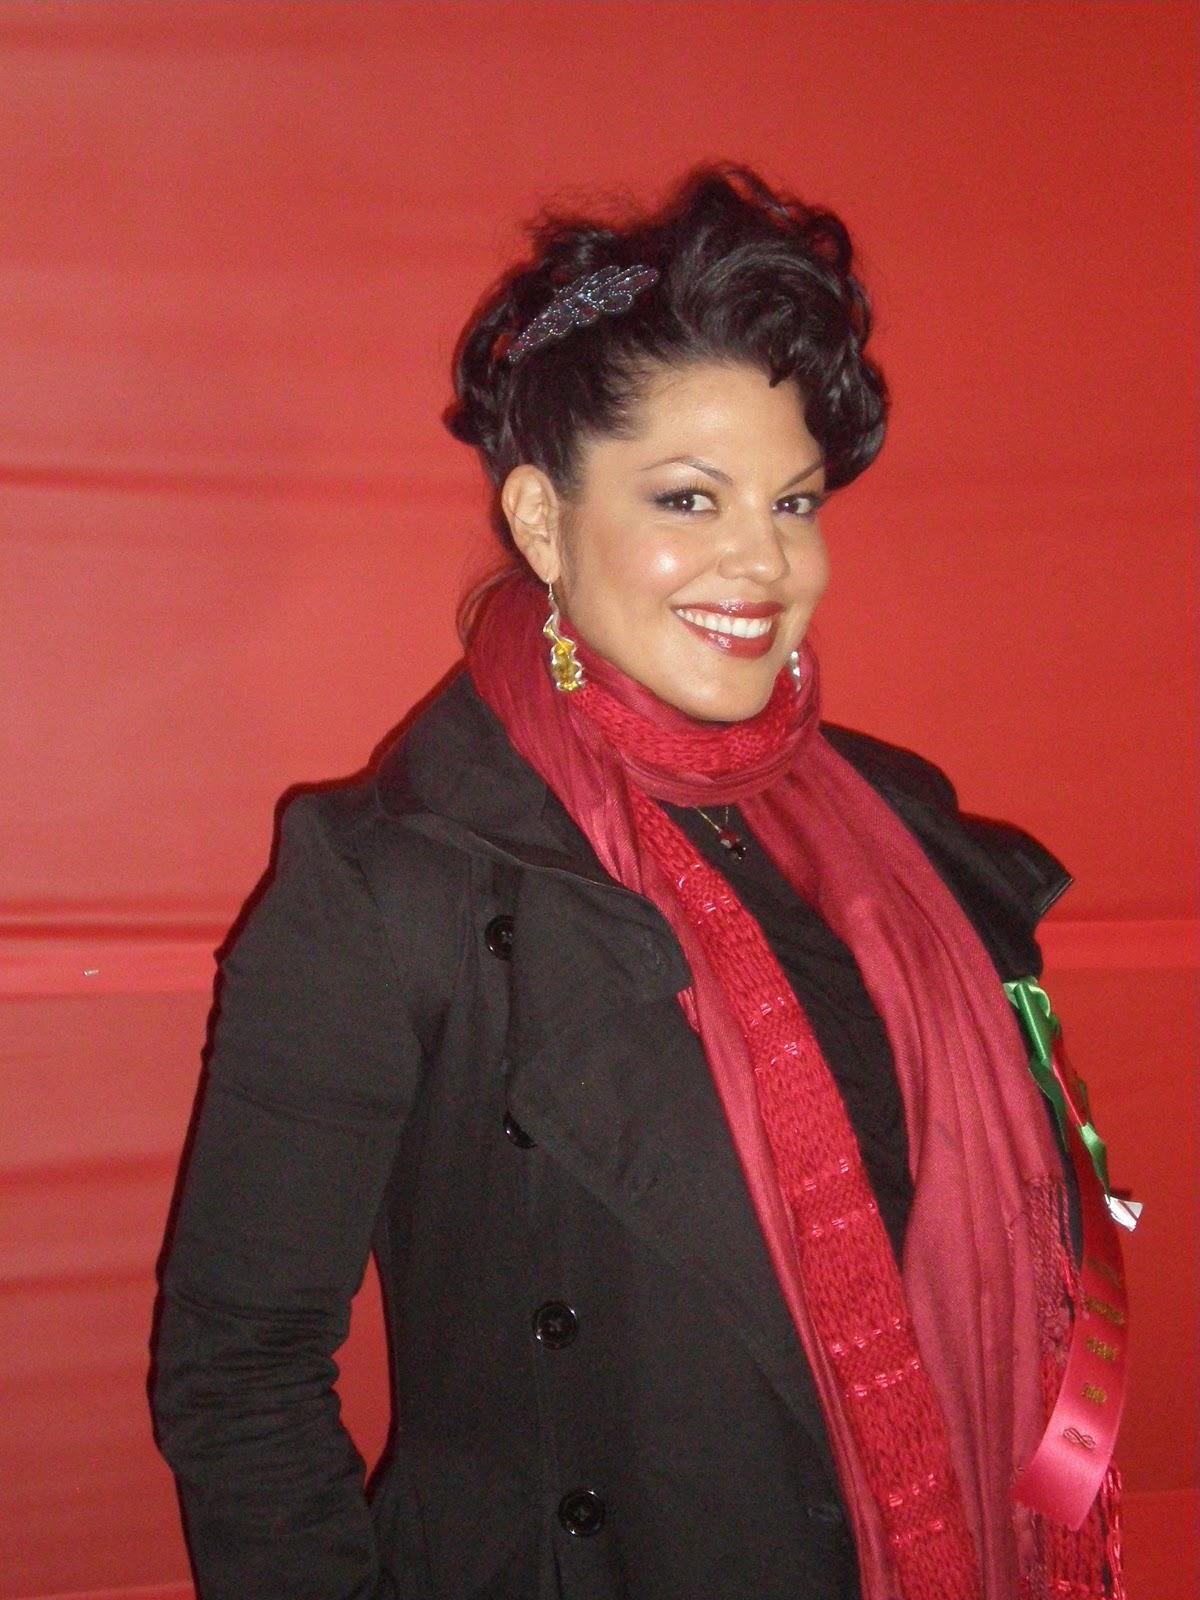 http://1.bp.blogspot.com/_vLpkrJRAti4/TQkbPchjmAI/AAAAAAAAALw/gKzv5uKLGgg/s1600/Sara%252BRamirez.JPG